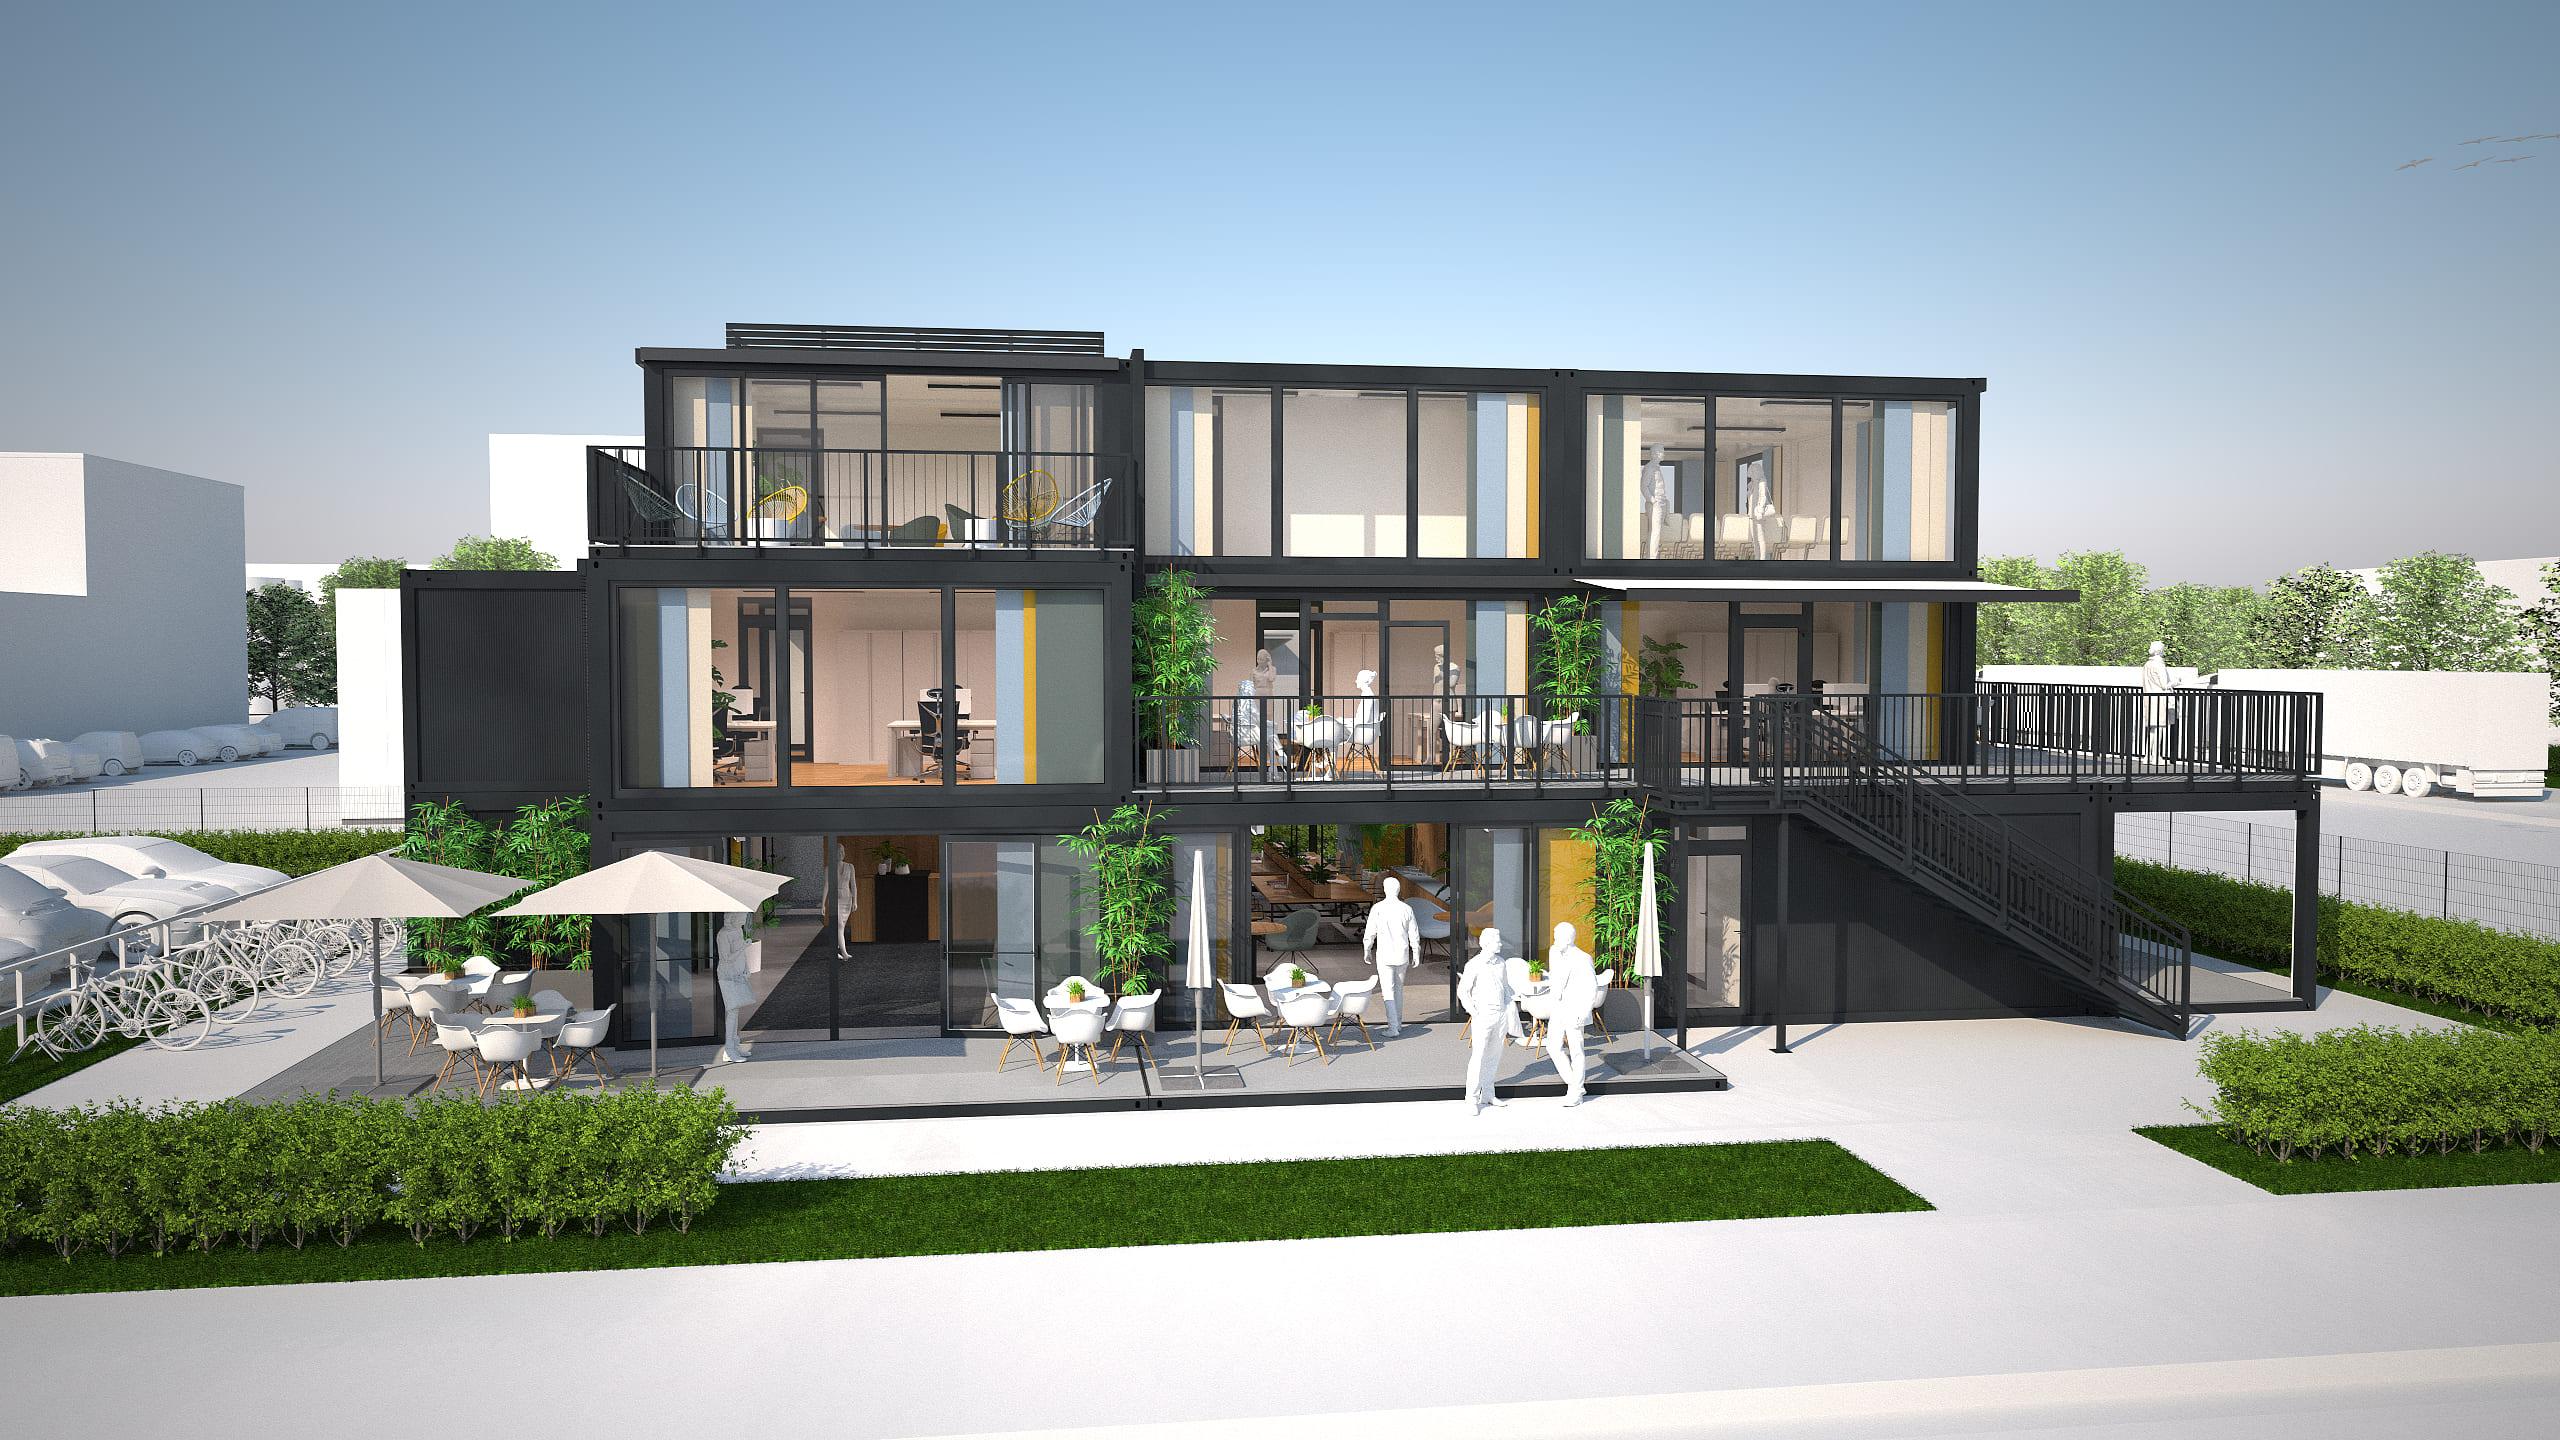 Planungsbüro-für-modulare-Architektur-JP-Spaces-Büro